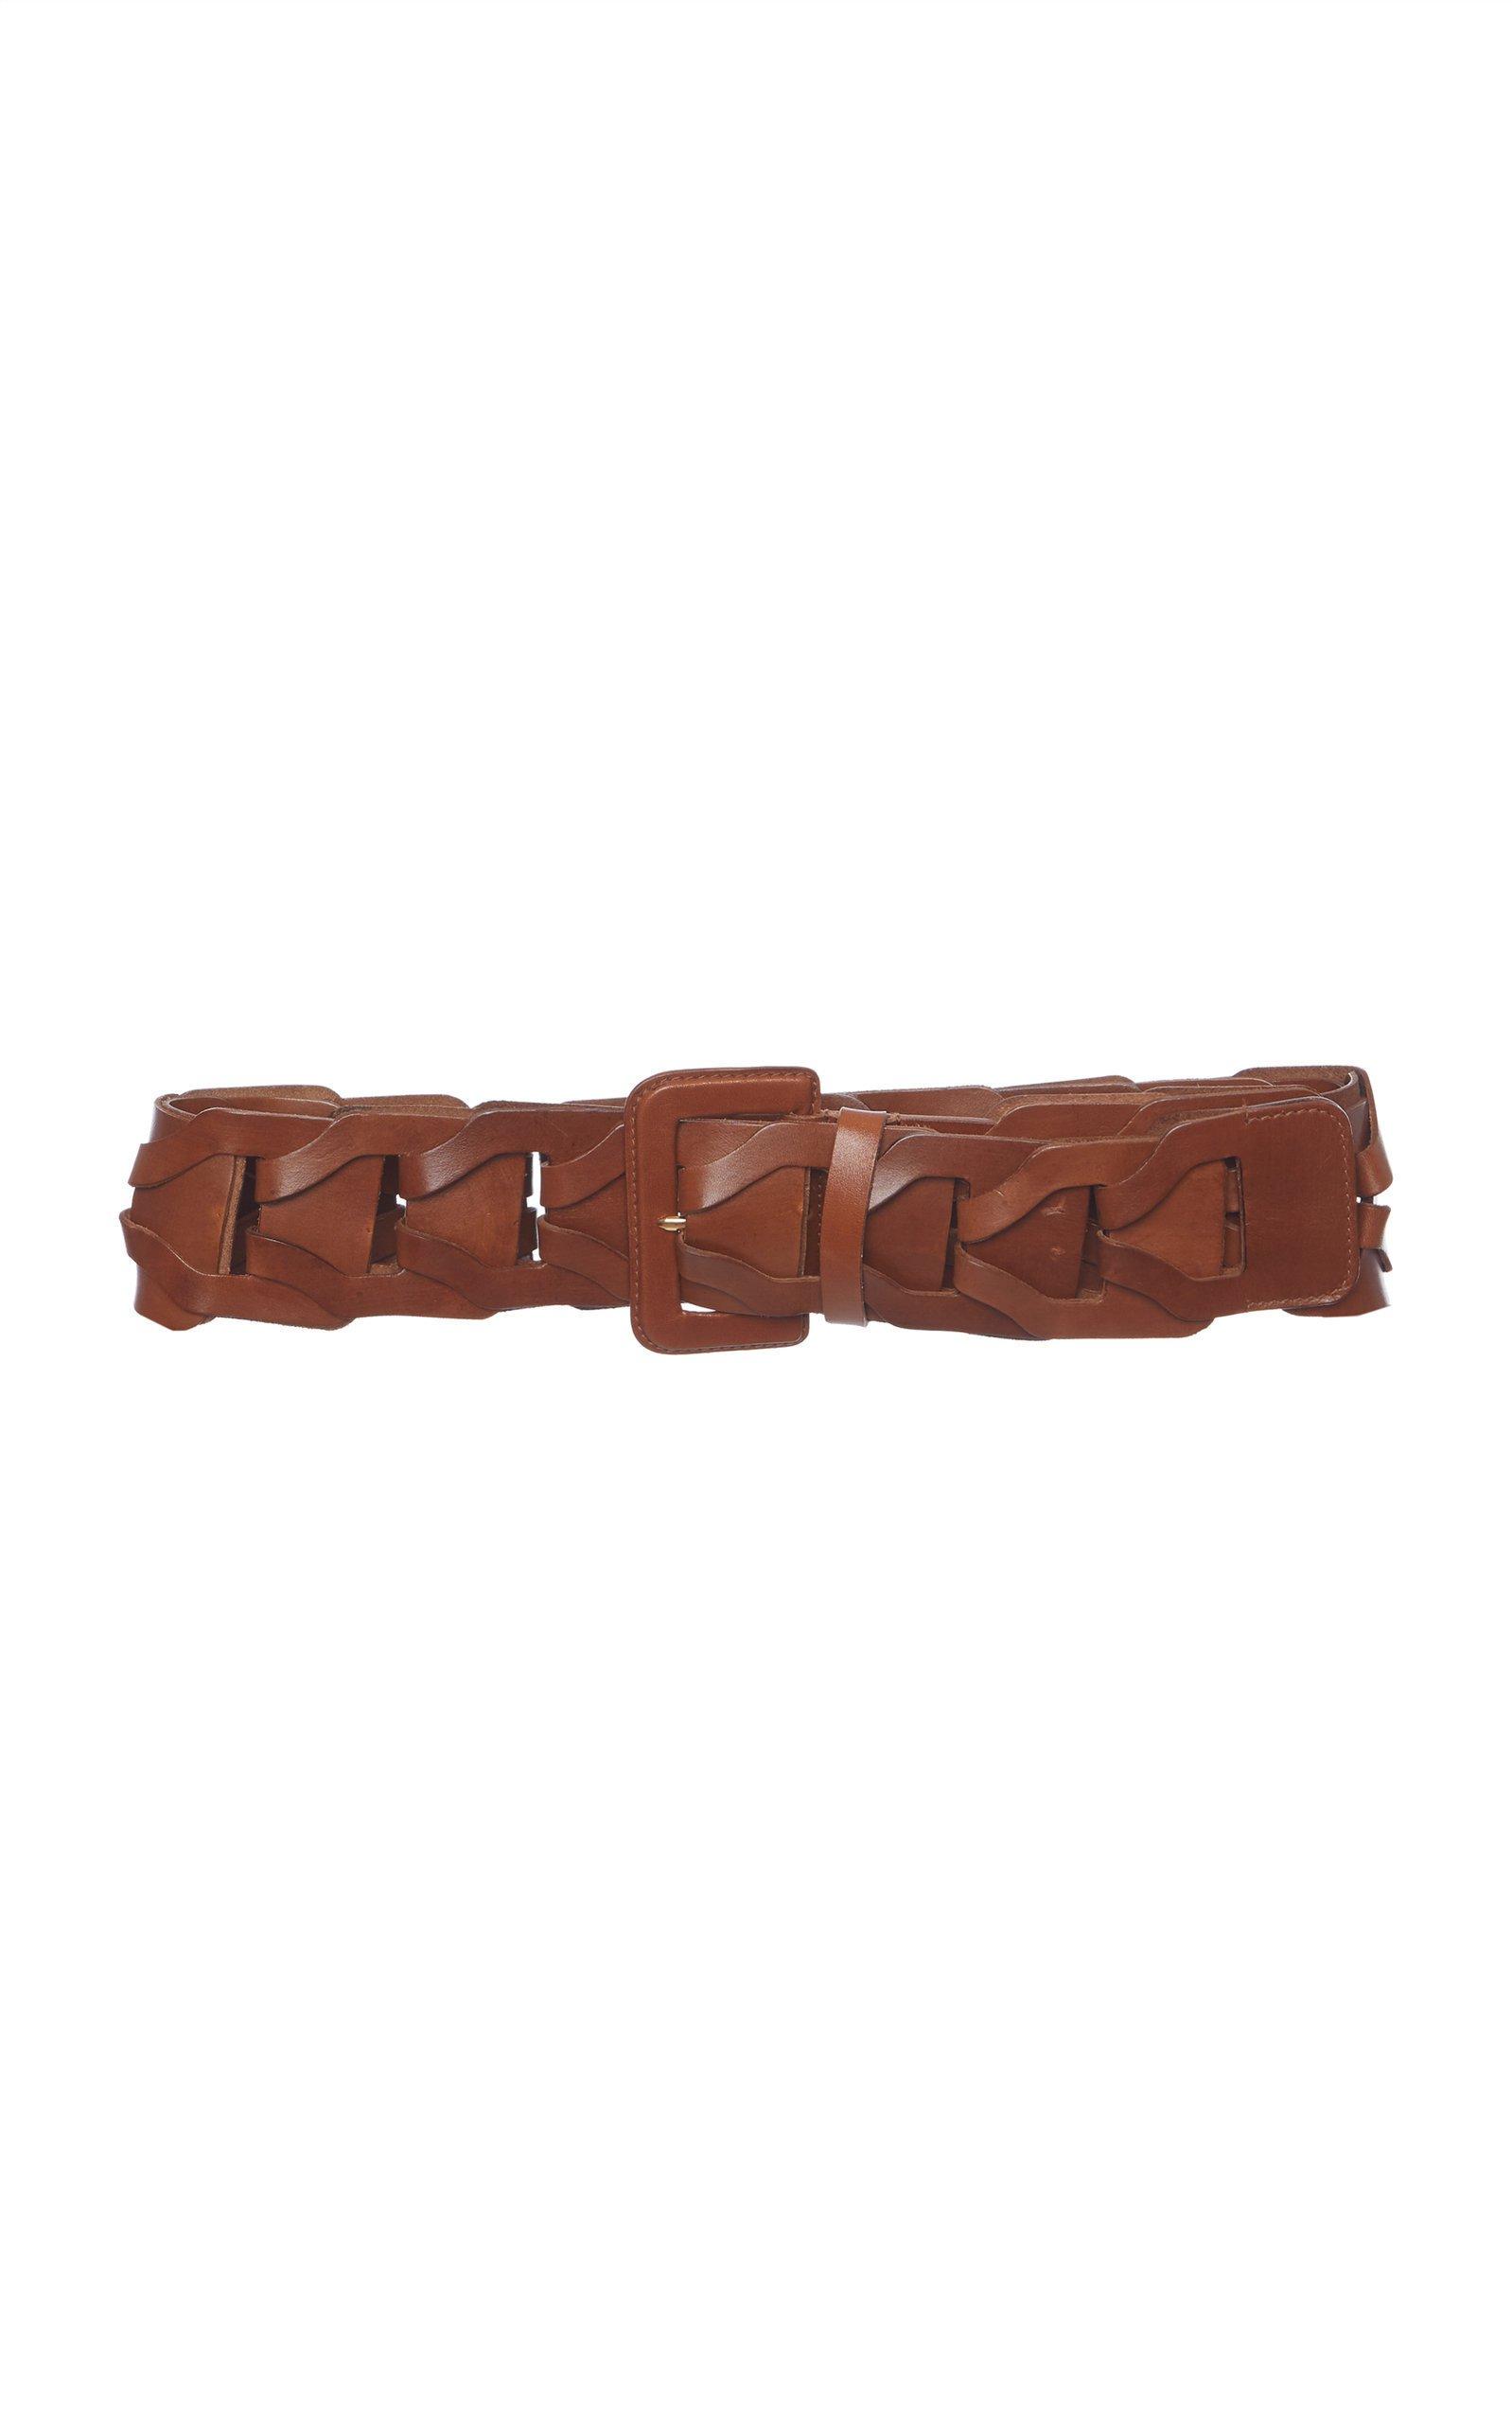 Prada Wide Woven Leather Belt Size: 105 cm